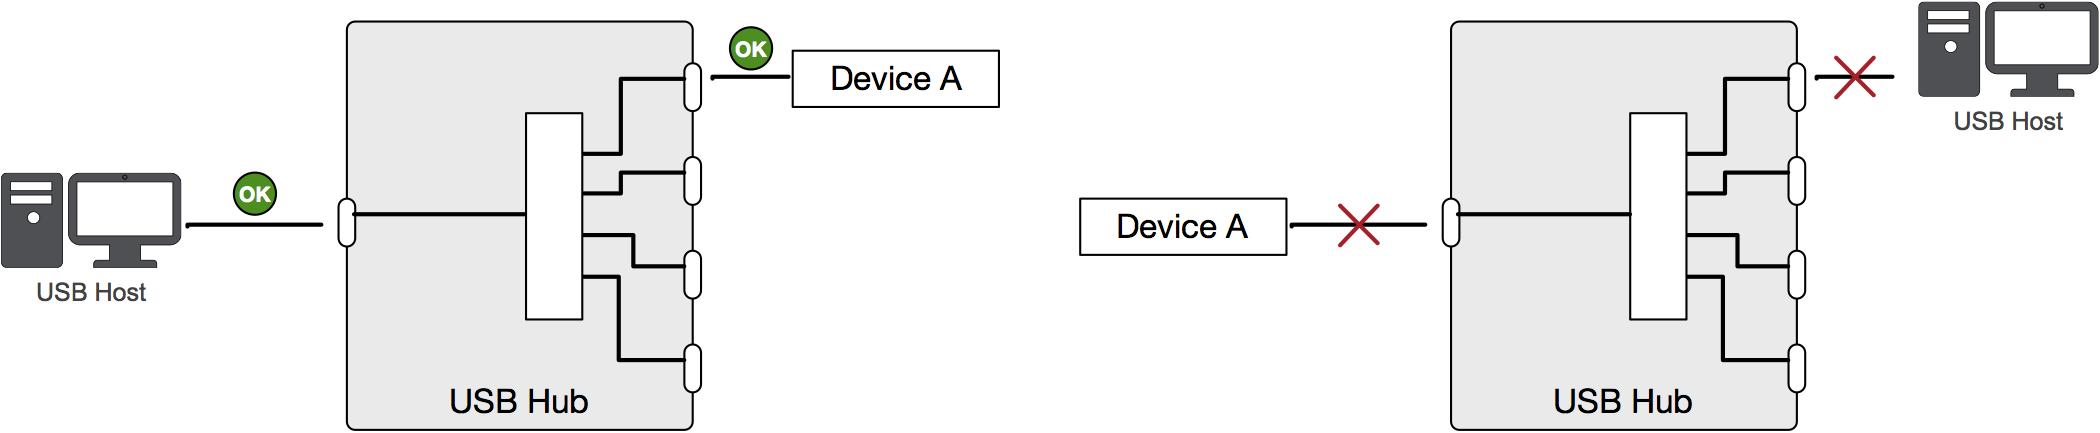 USB Hub or USB Switch? | Acroname